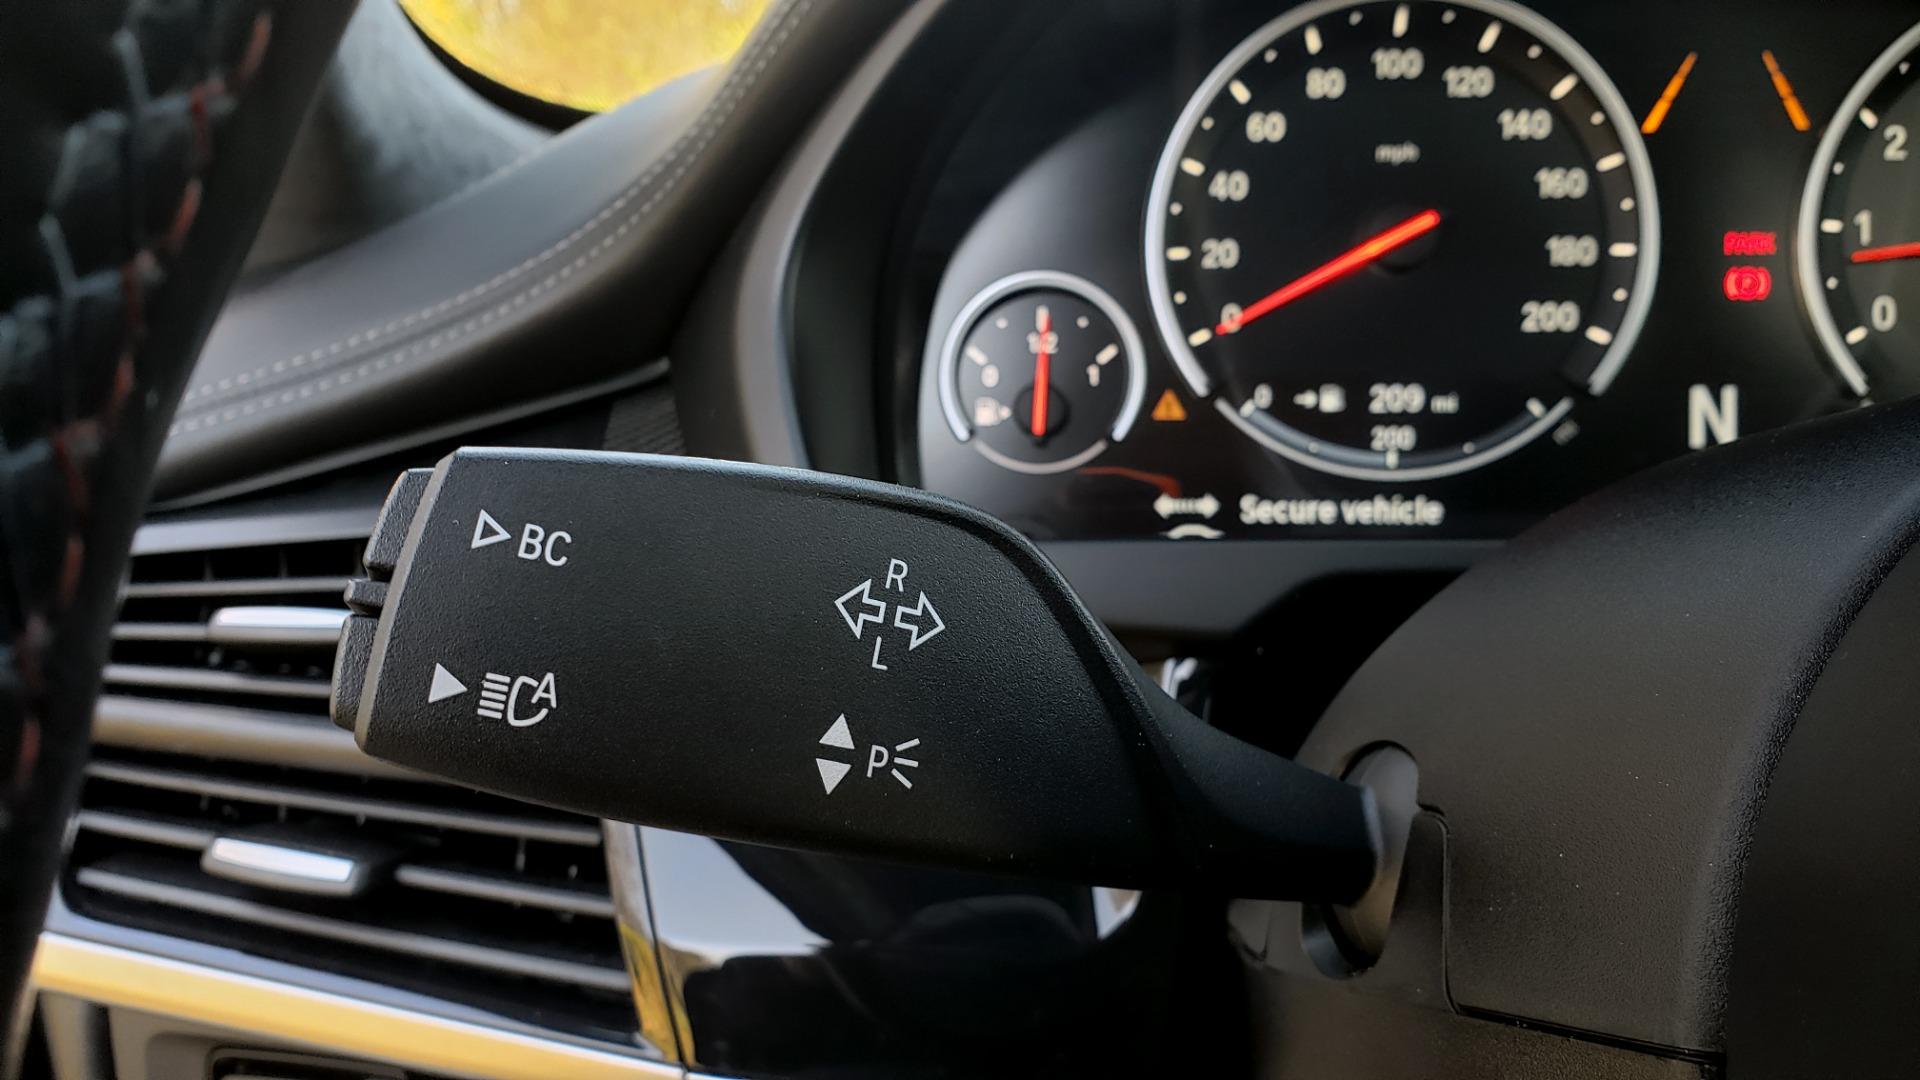 Used 2016 BMW X6 M EXEC PKG / DRVR ASST / NAV / SUNROOF / BLIND SPOT / REARVIEW for sale Sold at Formula Imports in Charlotte NC 28227 42